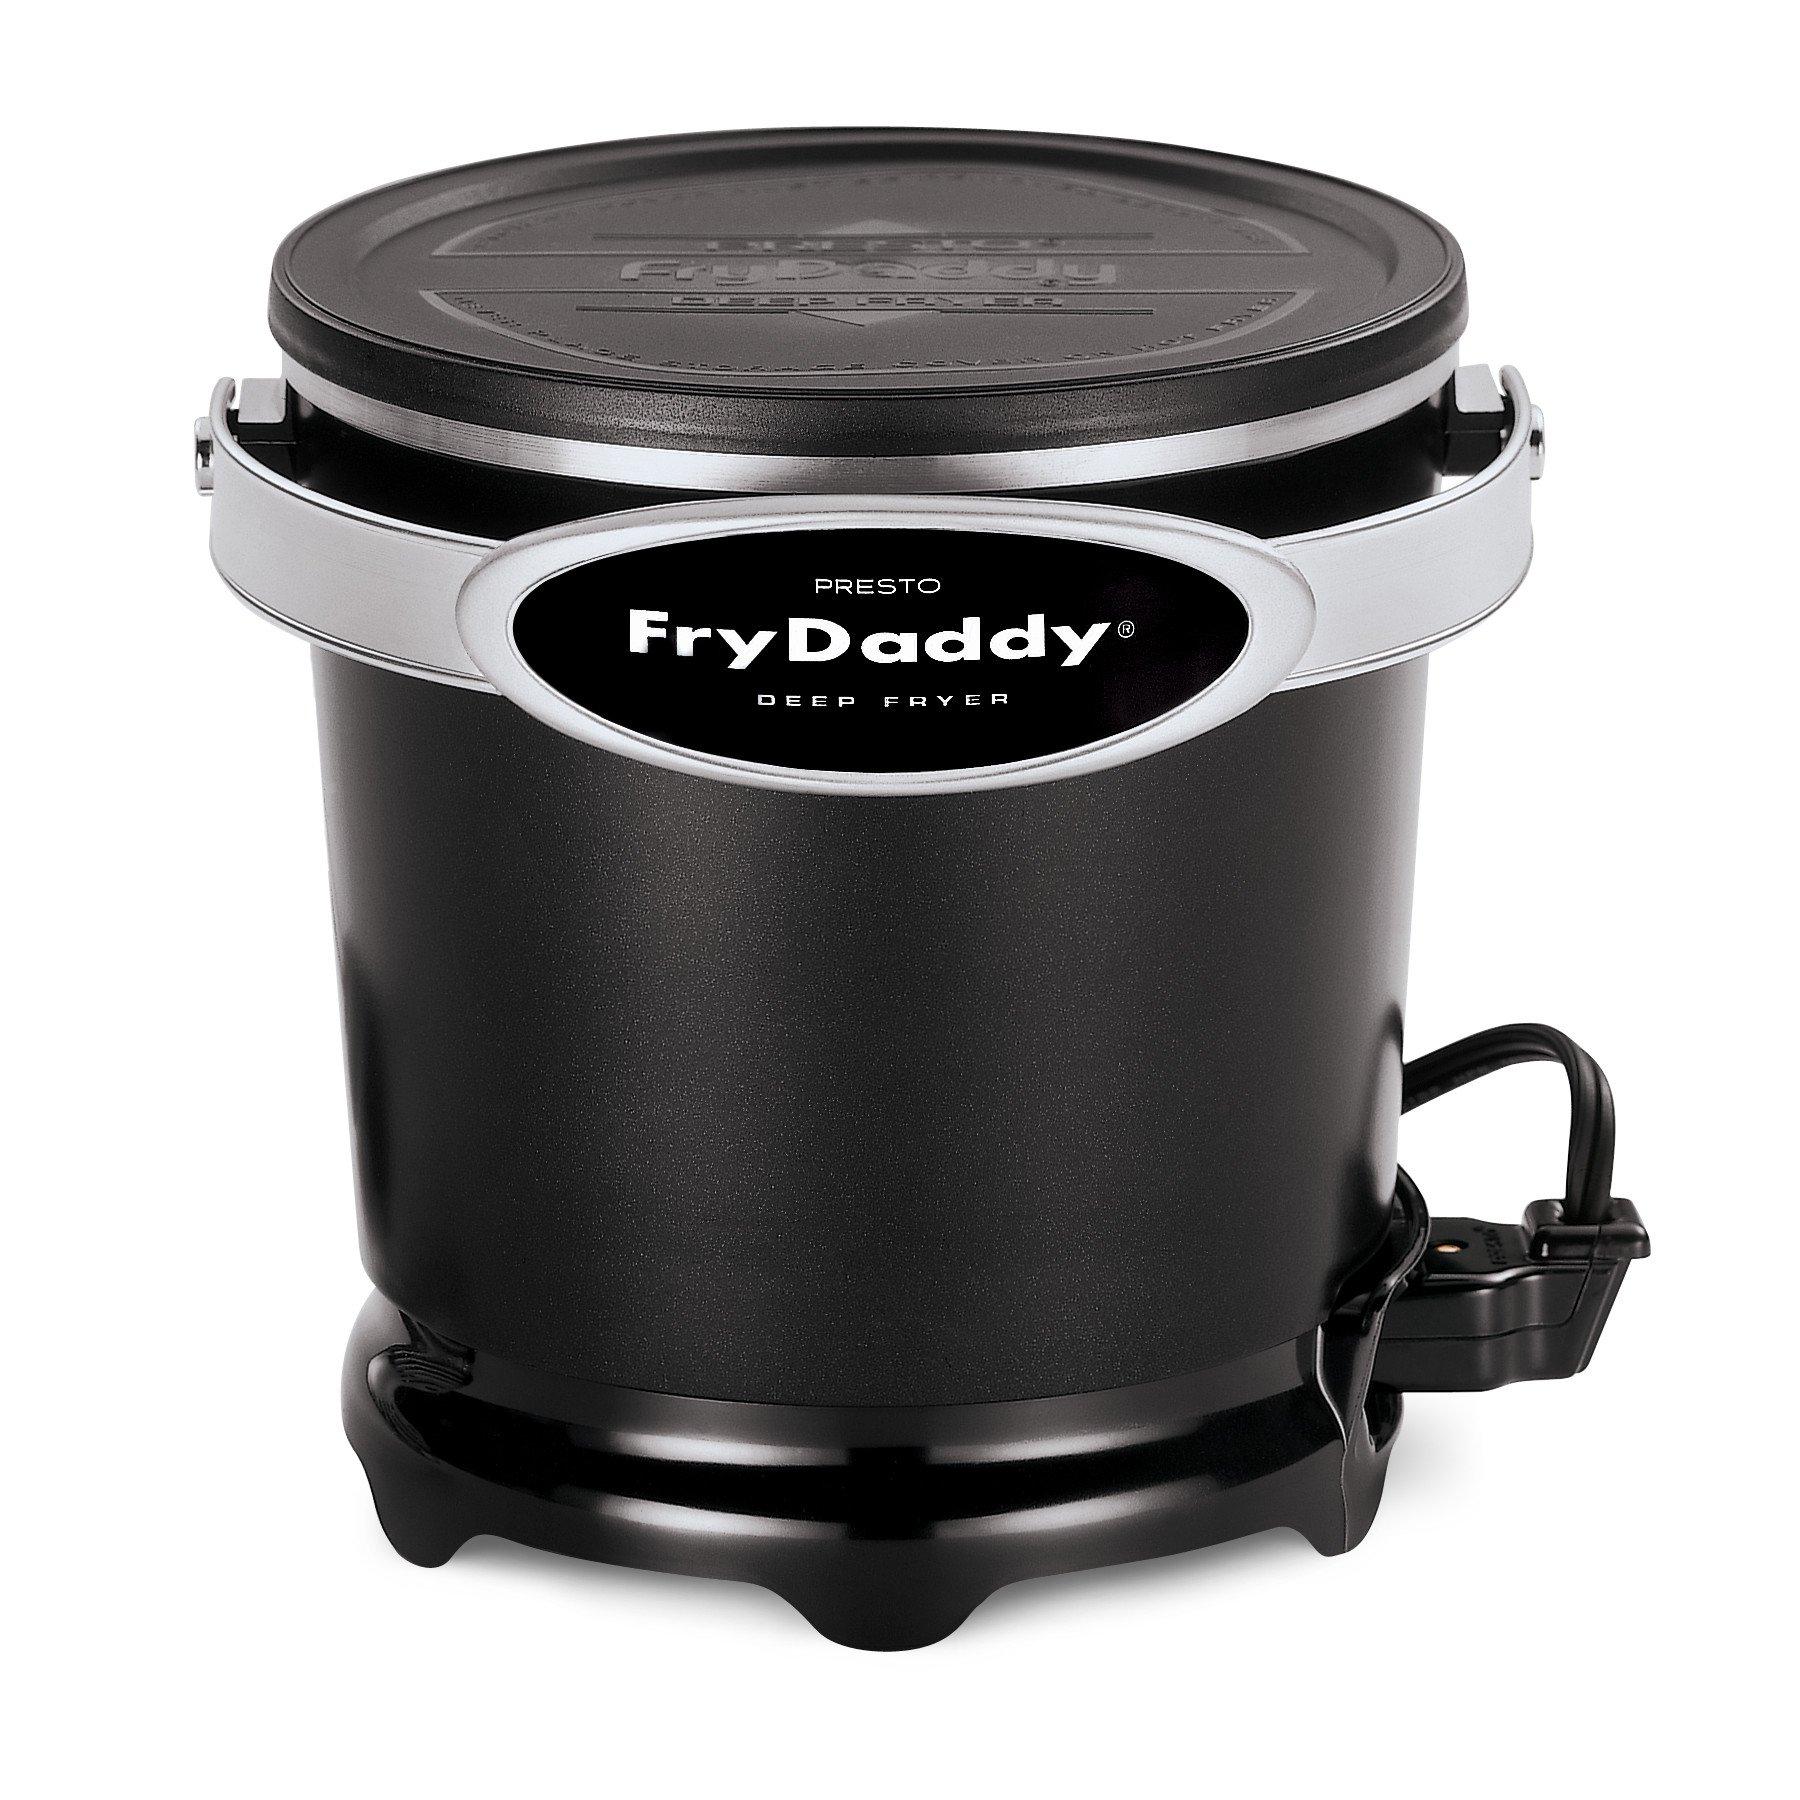 Presto 05420 FryDaddy Electric Fryer